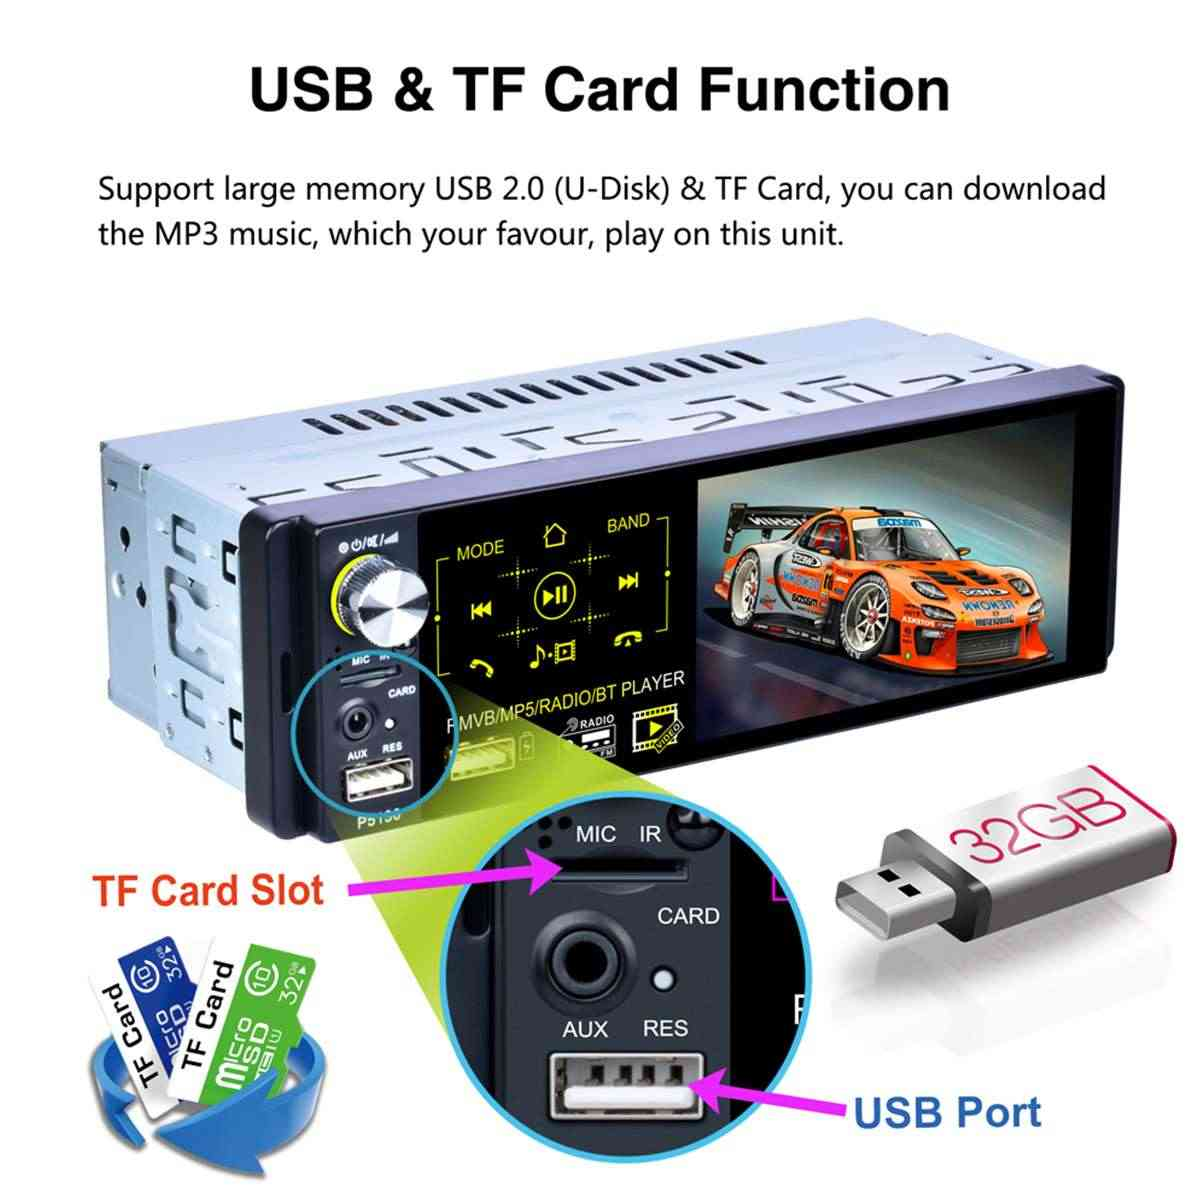 4.1 inç 1 DIN araba Stereo radyo Autoradio dokunmatik ekran MP5 çalar FM AM RDS bluetooth AUX geri görüş kamerası direksiyon kontrolü